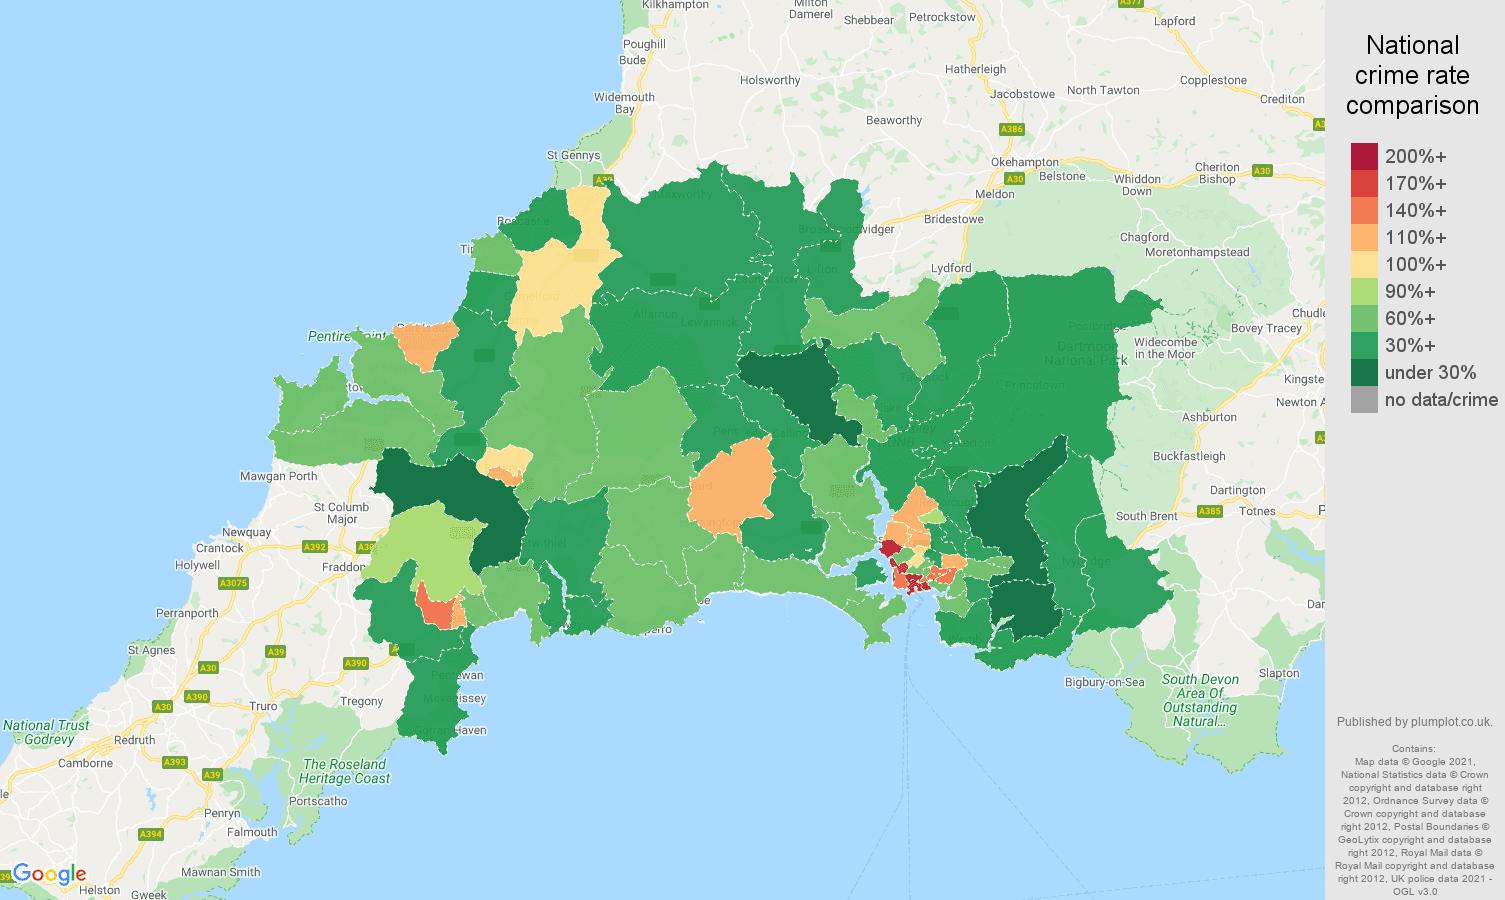 Plymouth antisocial behaviour crime rate comparison map